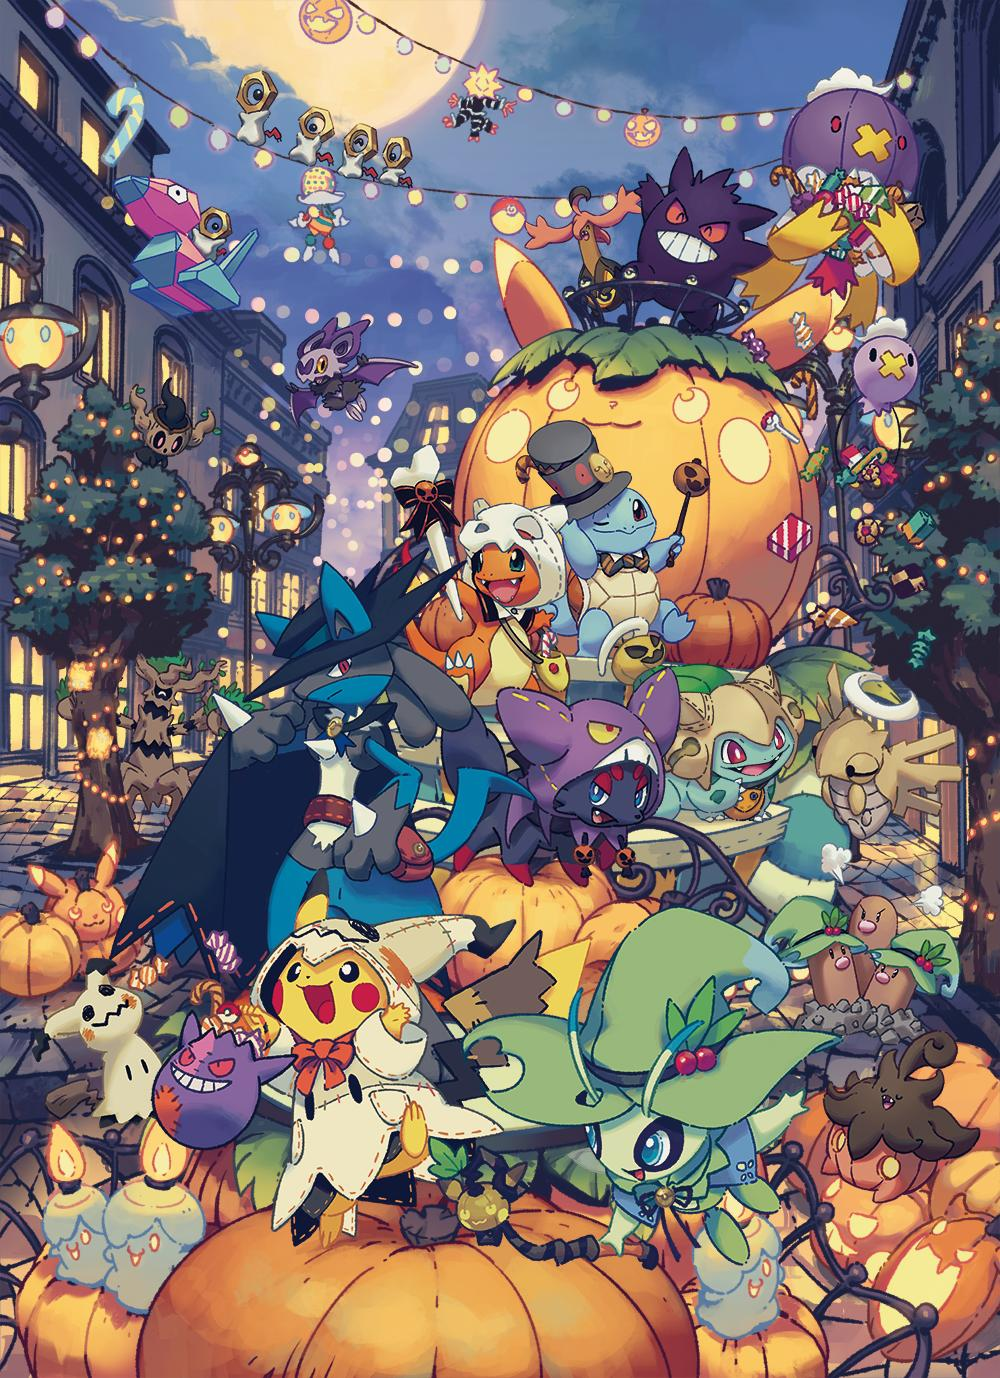 Pin By Melody On 1枚絵 Pokemon Backgrounds Cute Pokemon Wallpaper Pokemon